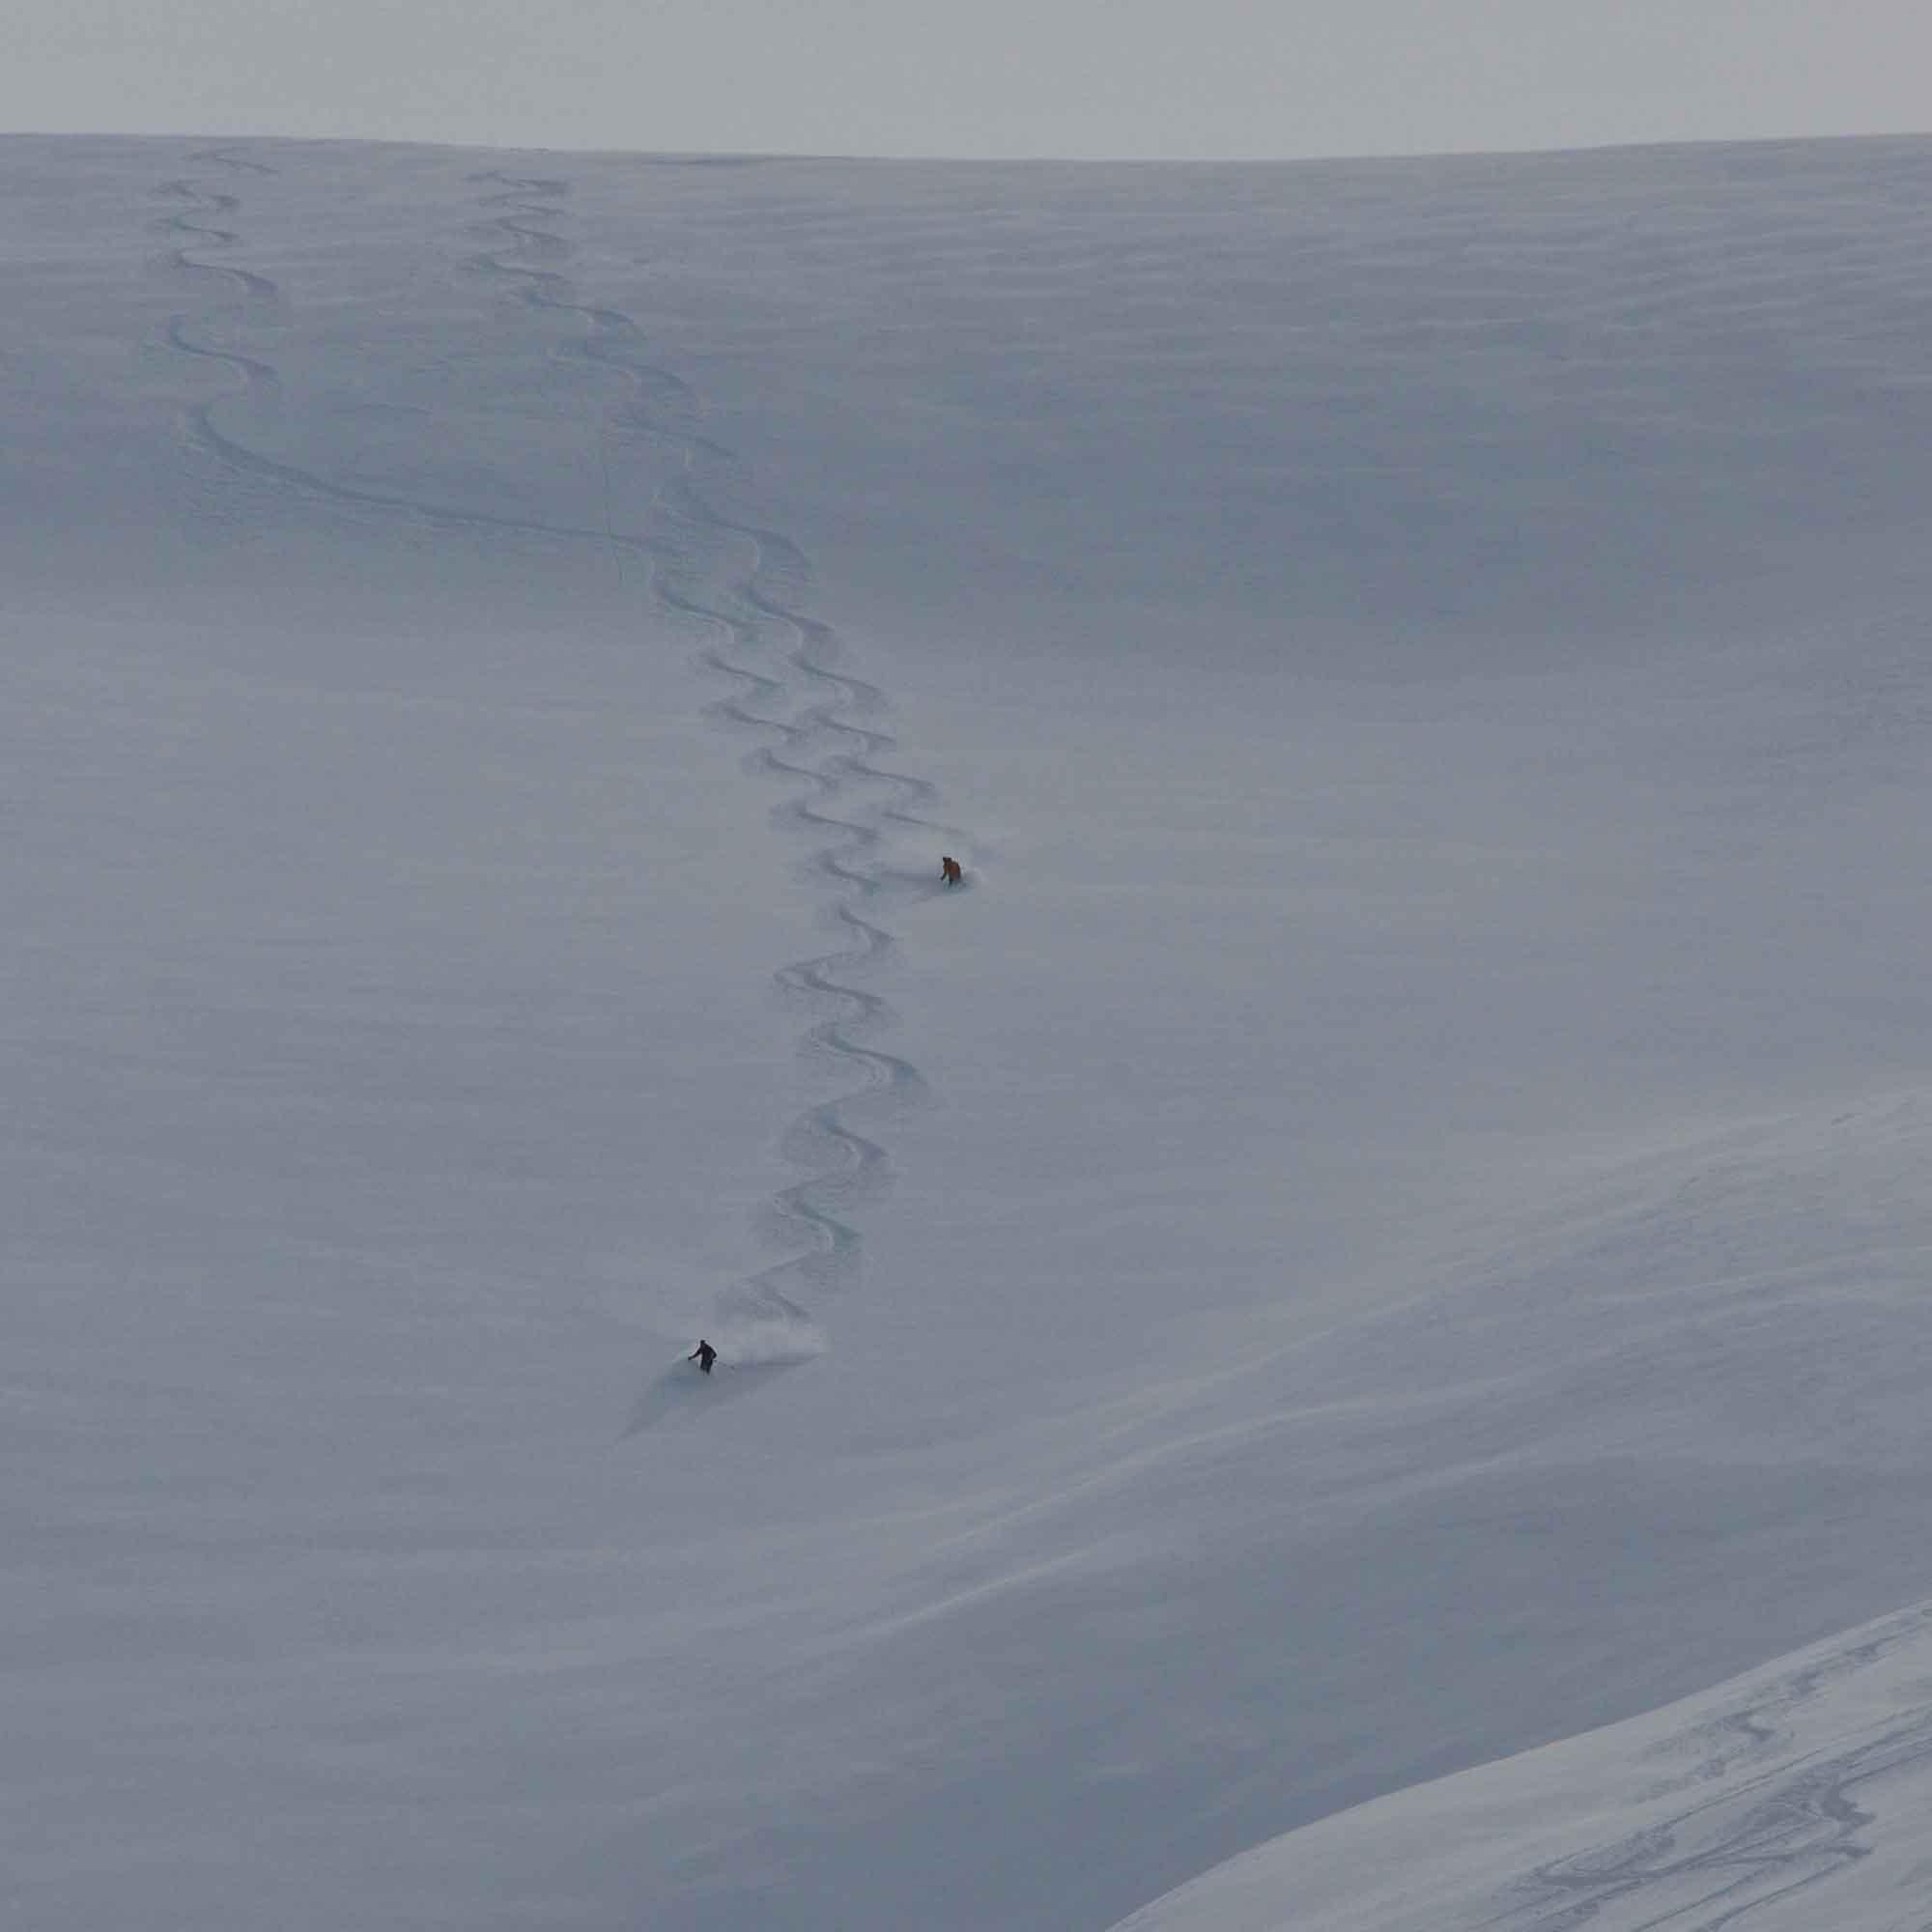 Skitour Risettenstock